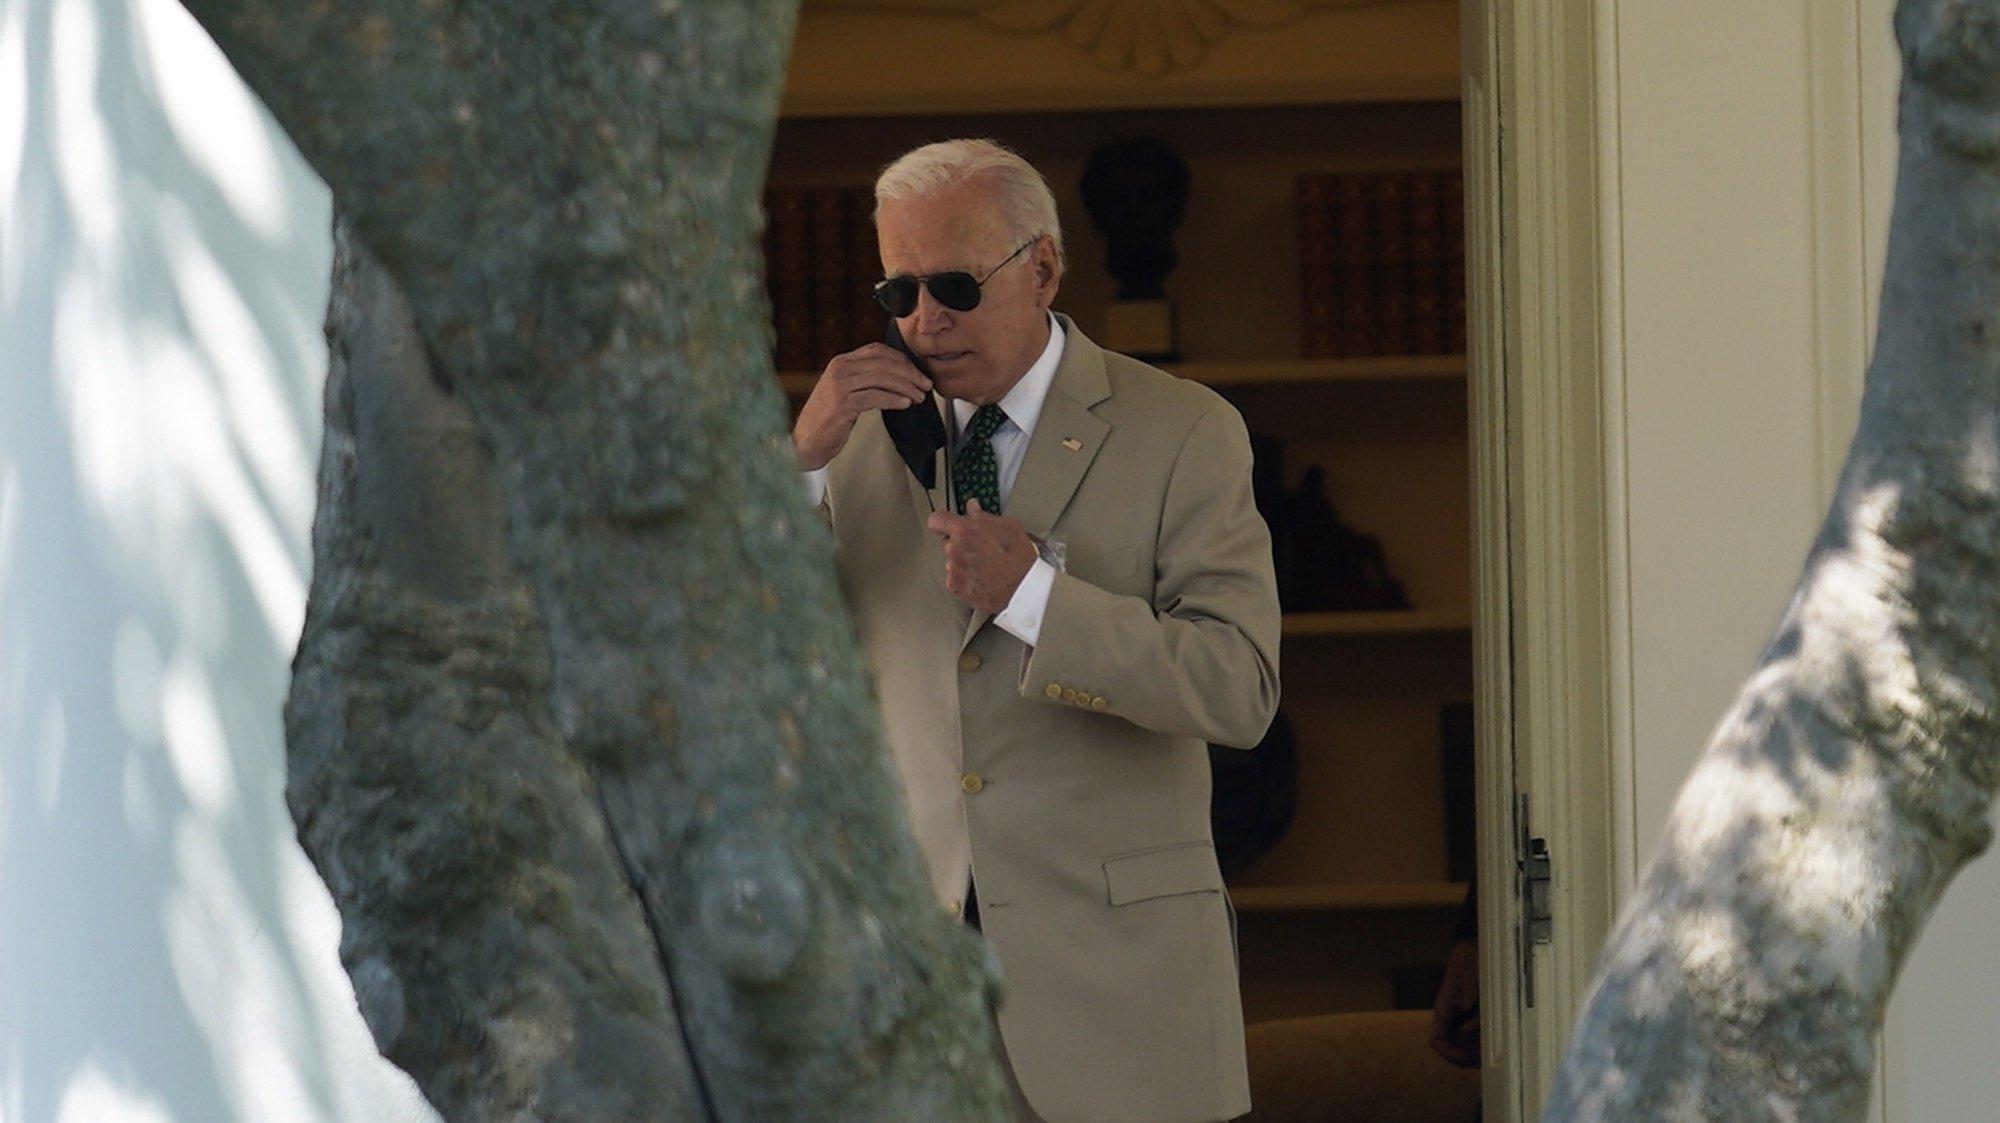 epa09401847 US President Joe Biden walks from the Oval Office as he departs the White House in Washington, DC, USA, 06 August 2021, en route Wilmington, Delaware.  EPA/Yuri Gripas / POOL